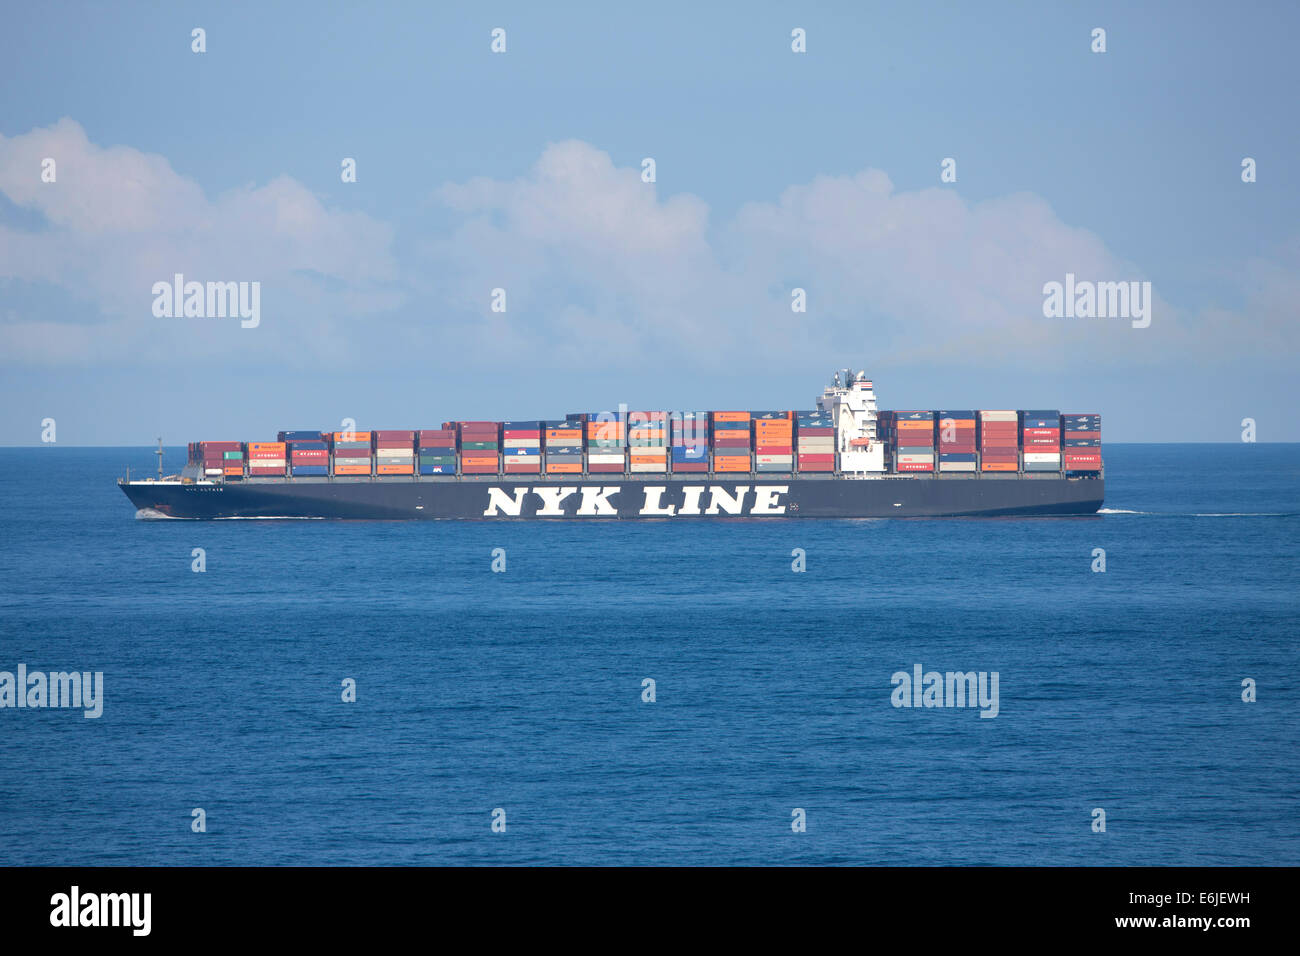 NYK Line Altair cargo container ship in Mediterranean sea Stock